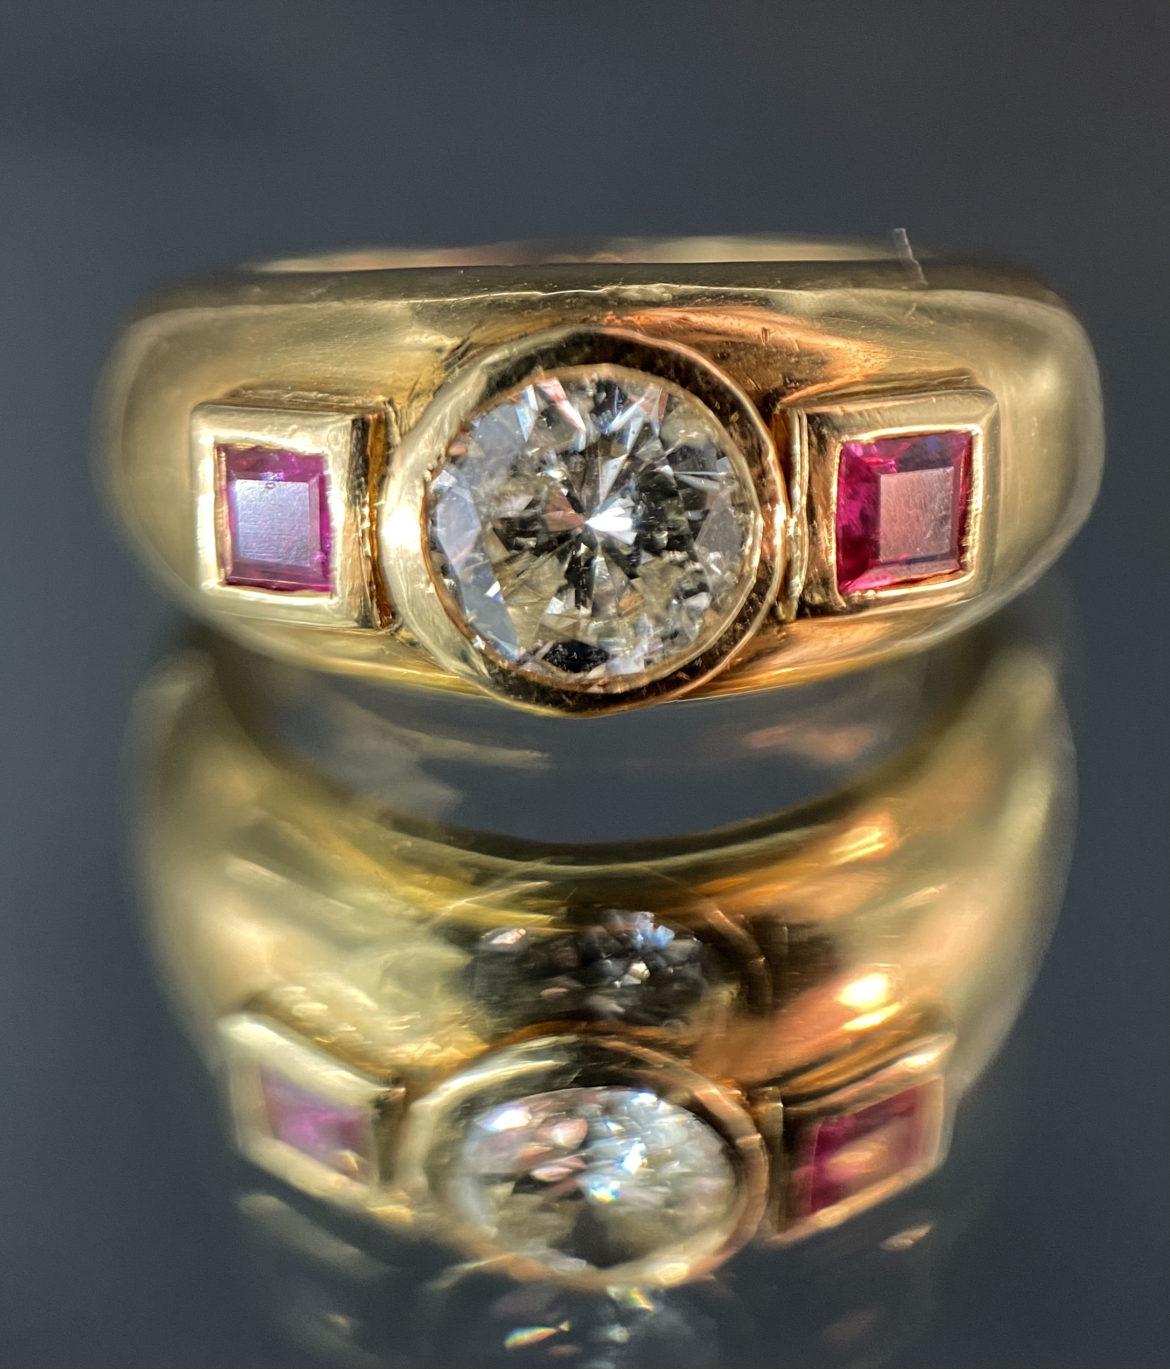 60 Bague diamant taille brillant et rubis